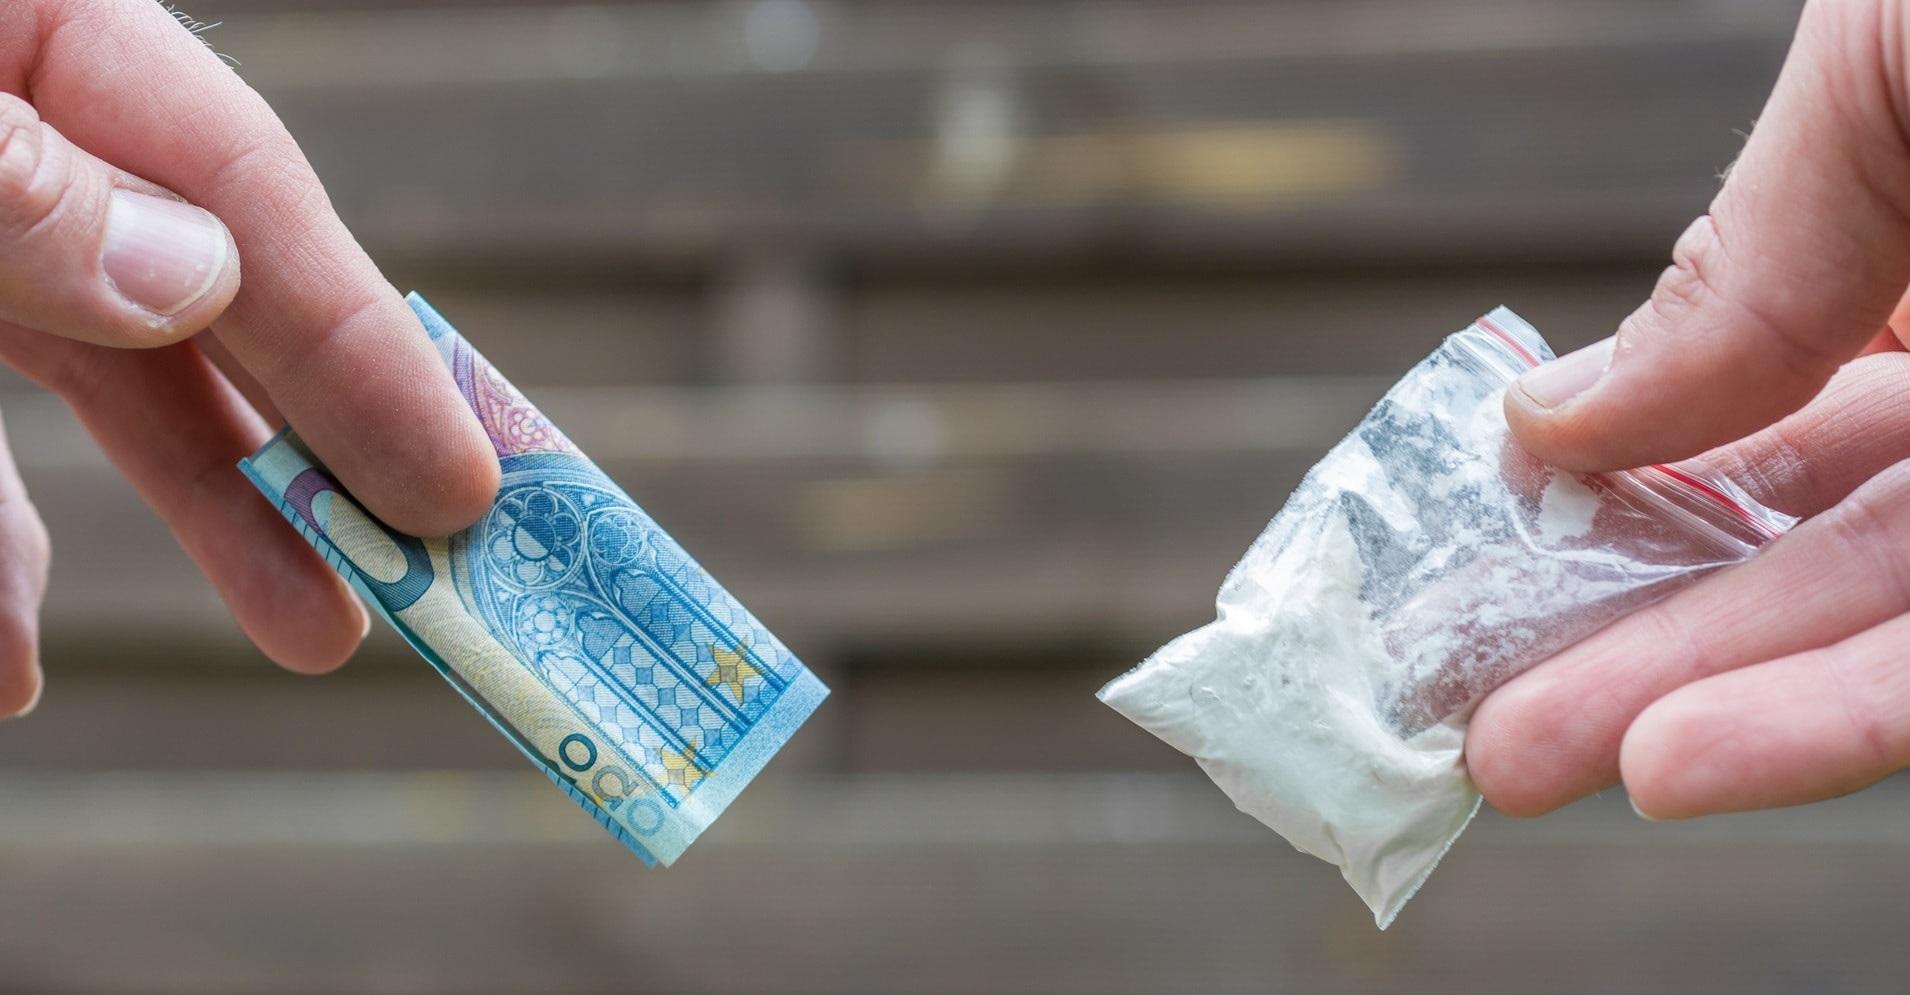 Rechtsanwalt Clemens Louis unerlaubter Handel mit Betäubungsmitteln